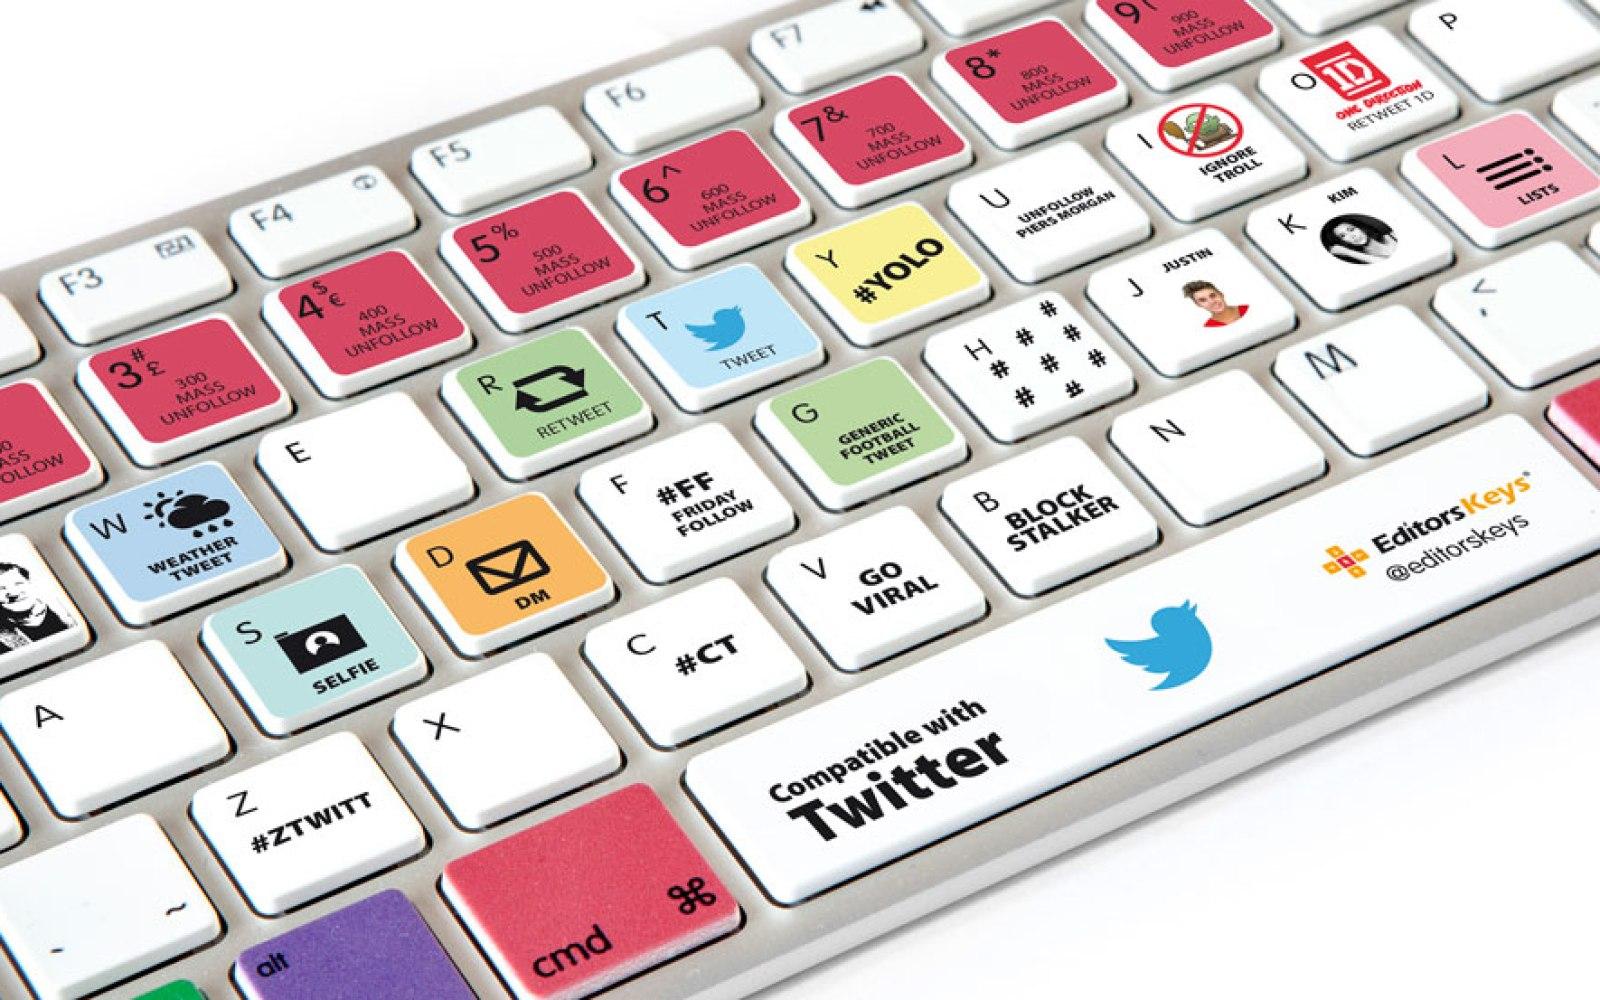 Pro Twitter users: Editors Keys launches custom Apple keyboard for Twitter